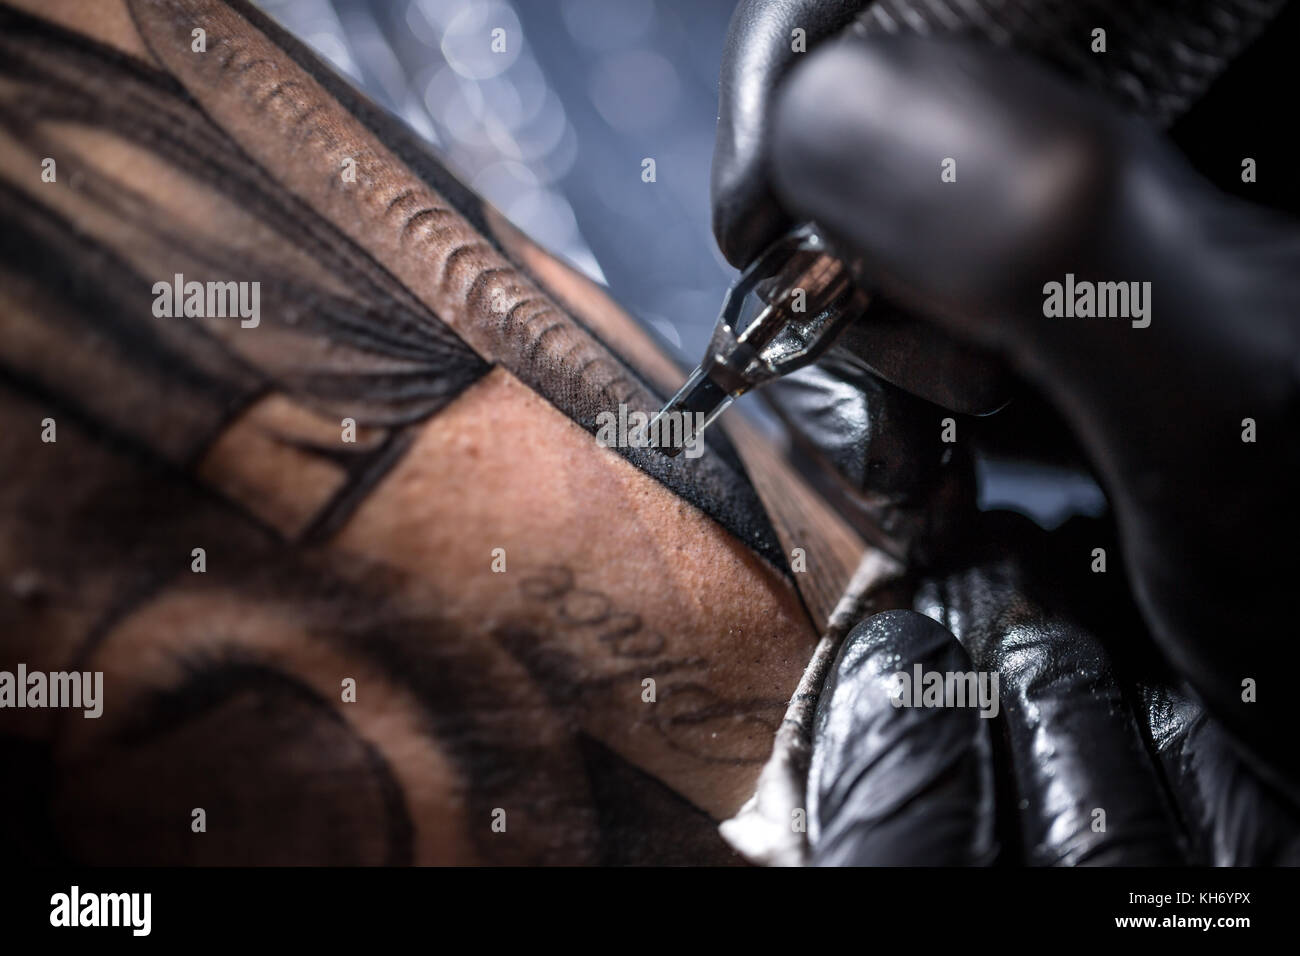 Tatoueur professionnel fait un tatouage Photo Stock